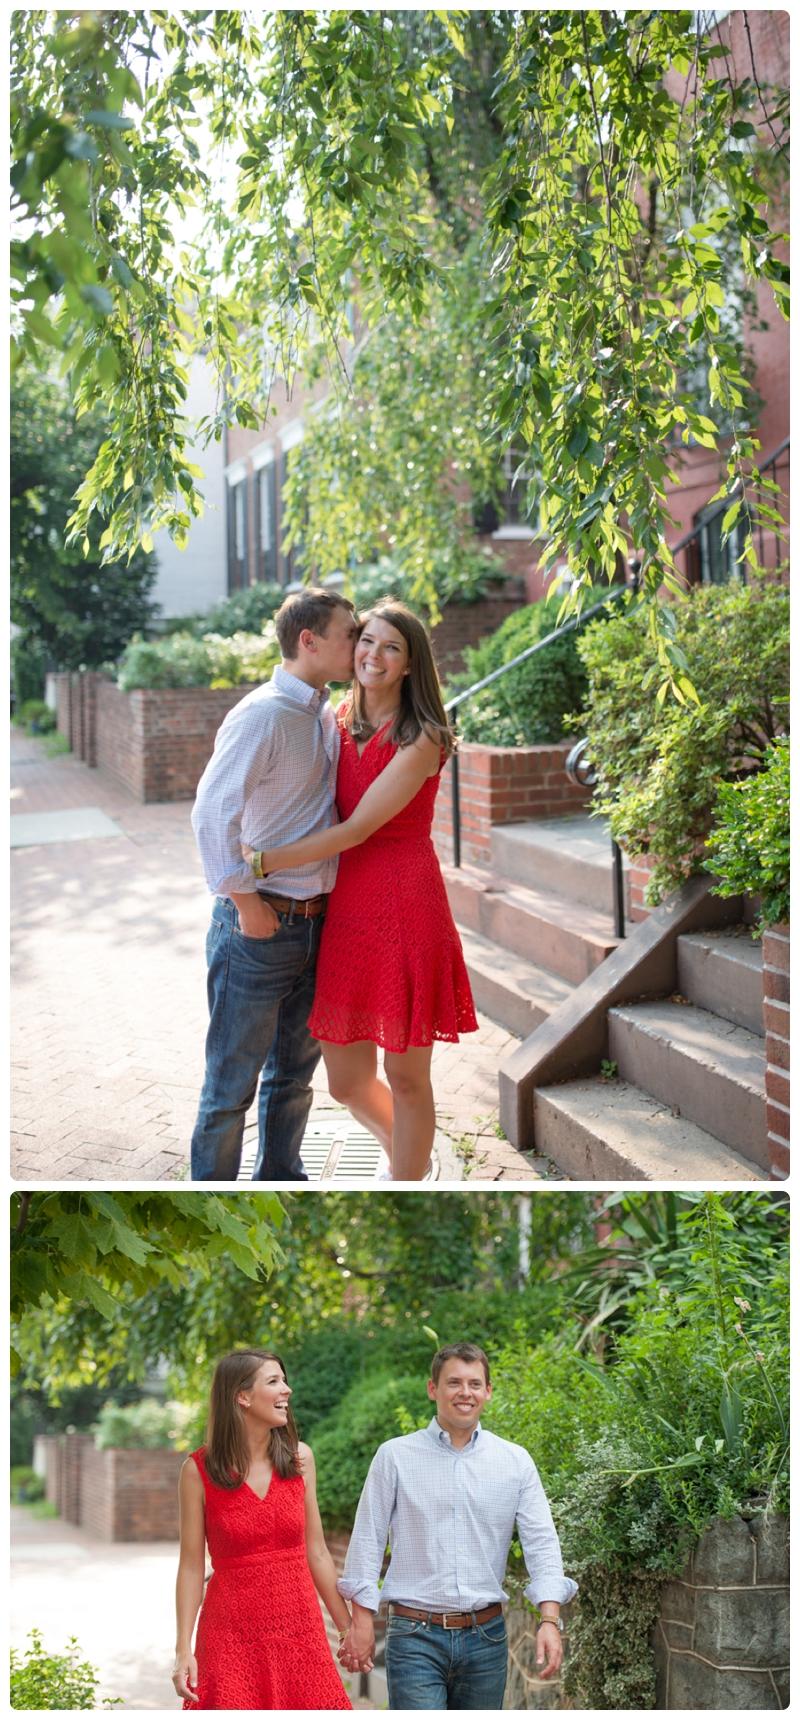 Engagement Photos in Georgetown, Washington, DC by www.rachaelfosterphoto.com_0021.jpg